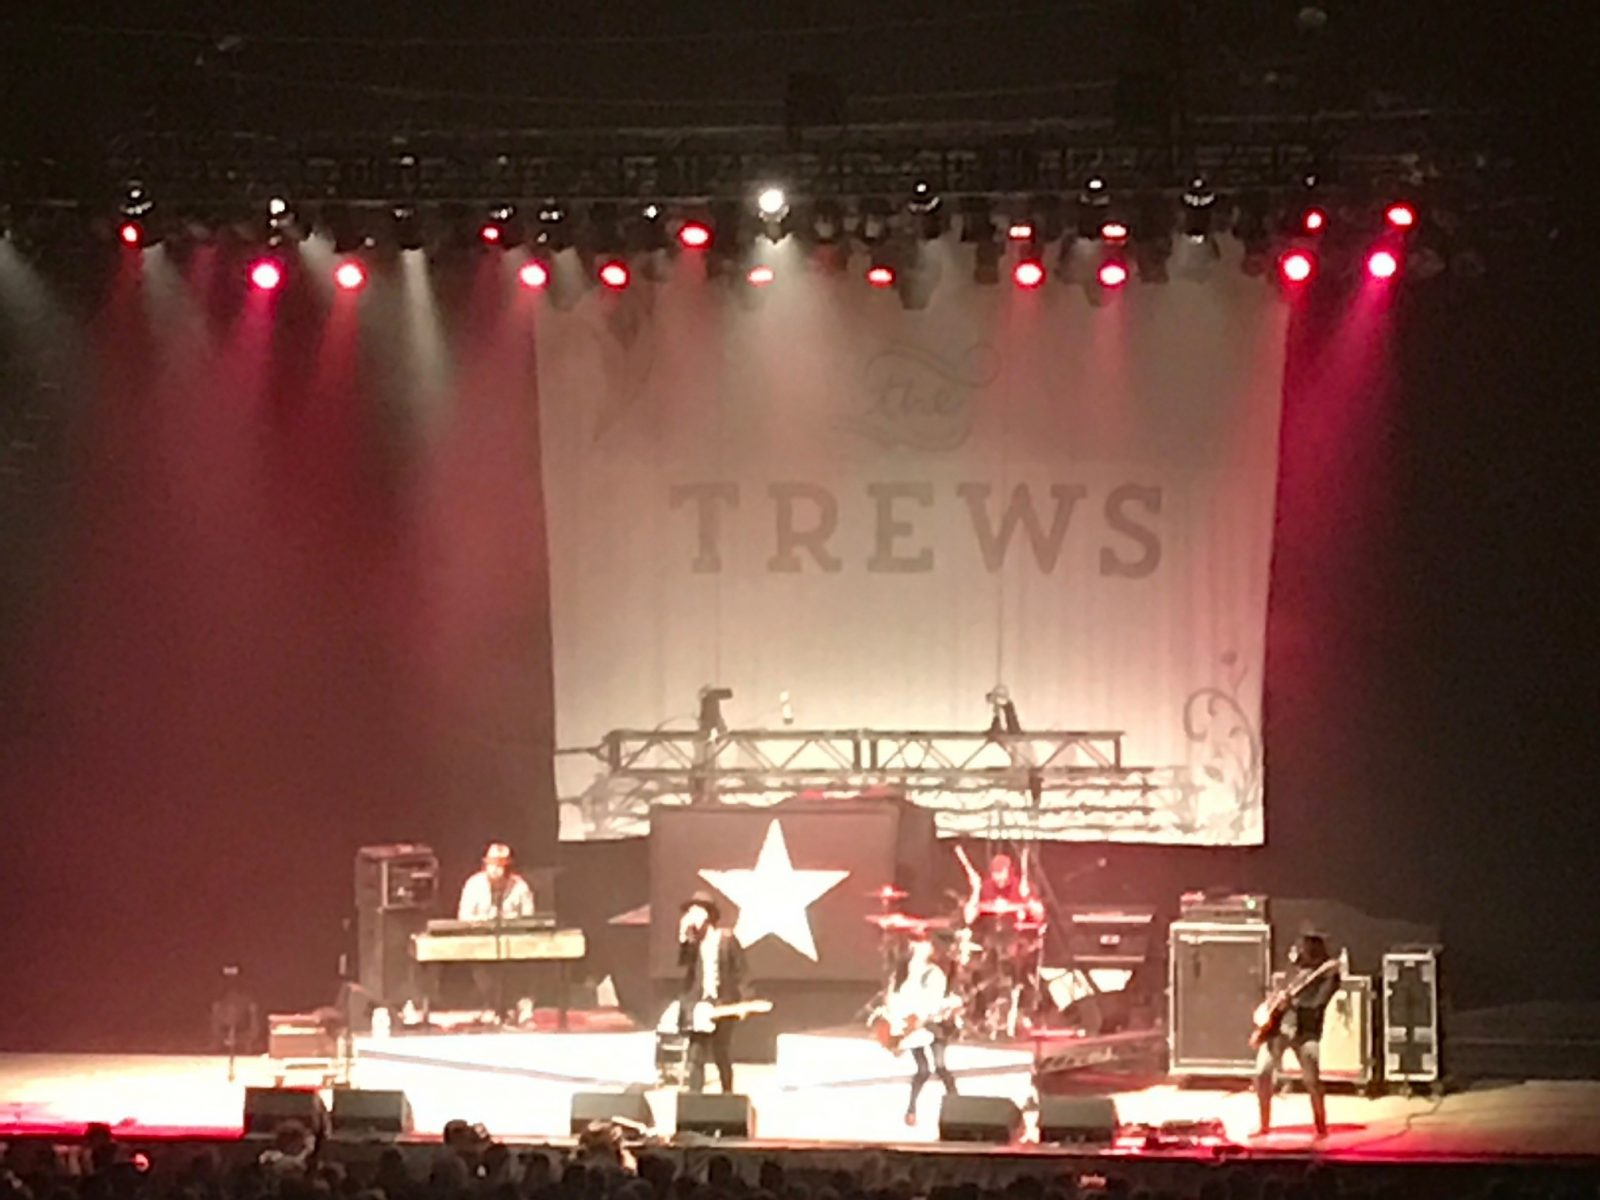 trews-2